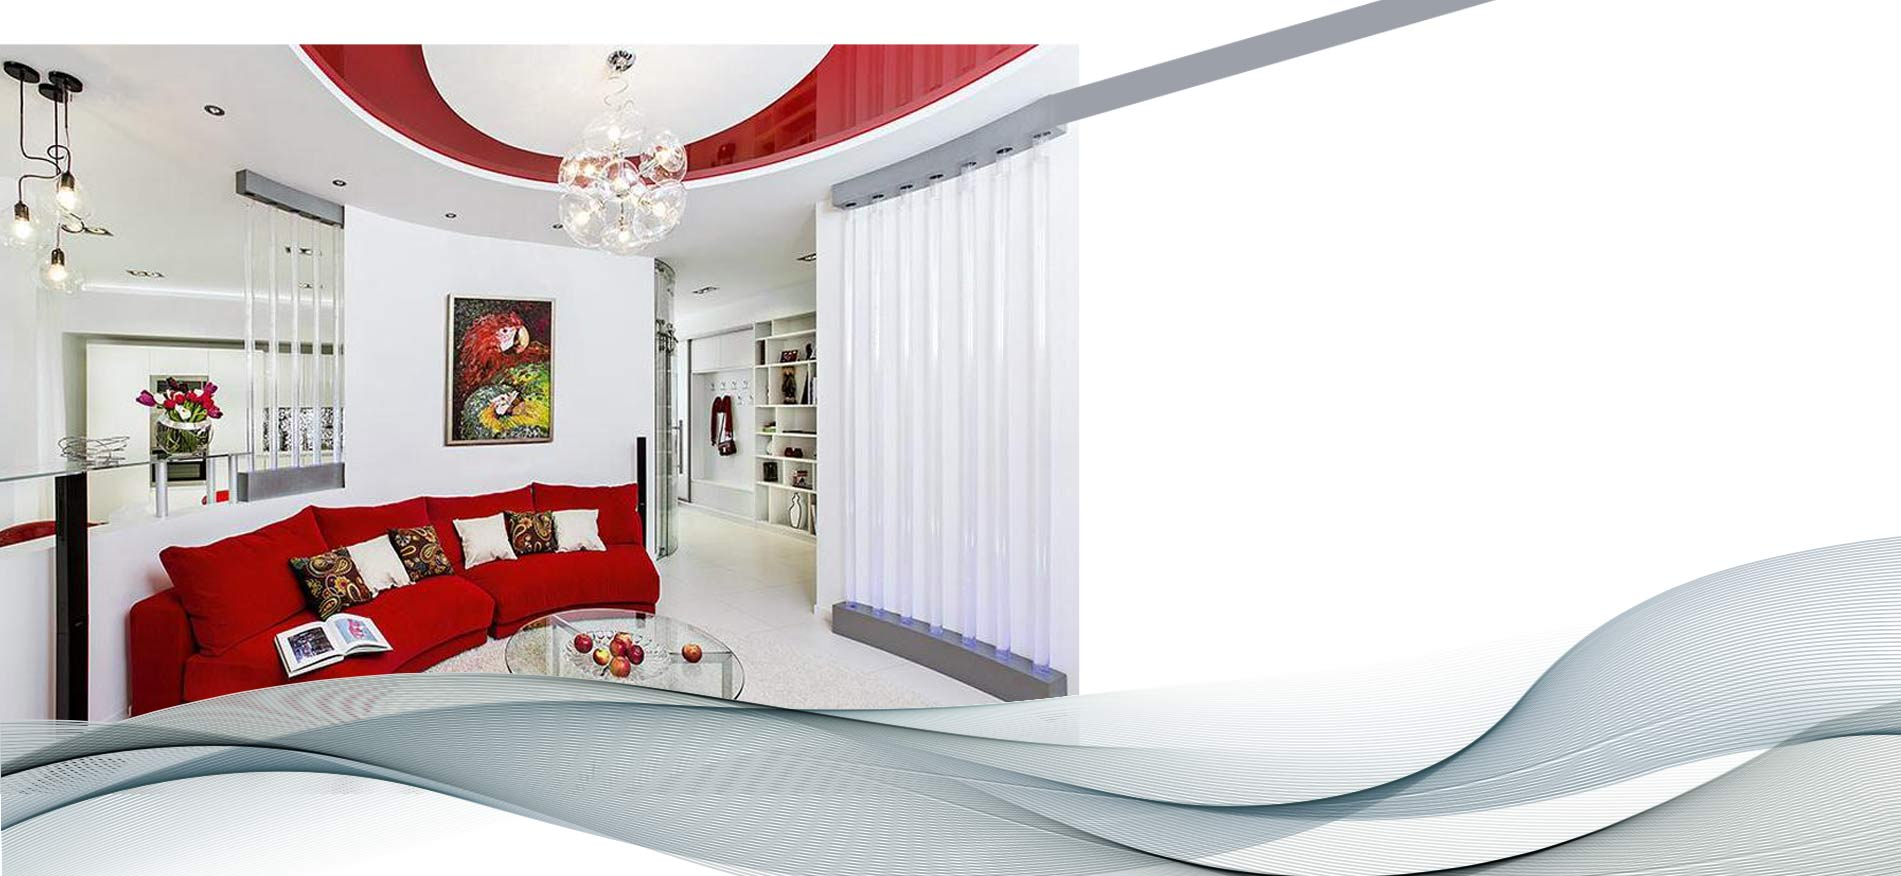 tarahi dakheli 10 - طبقه بندی و نظم دهی در دکوراسیون داخلی